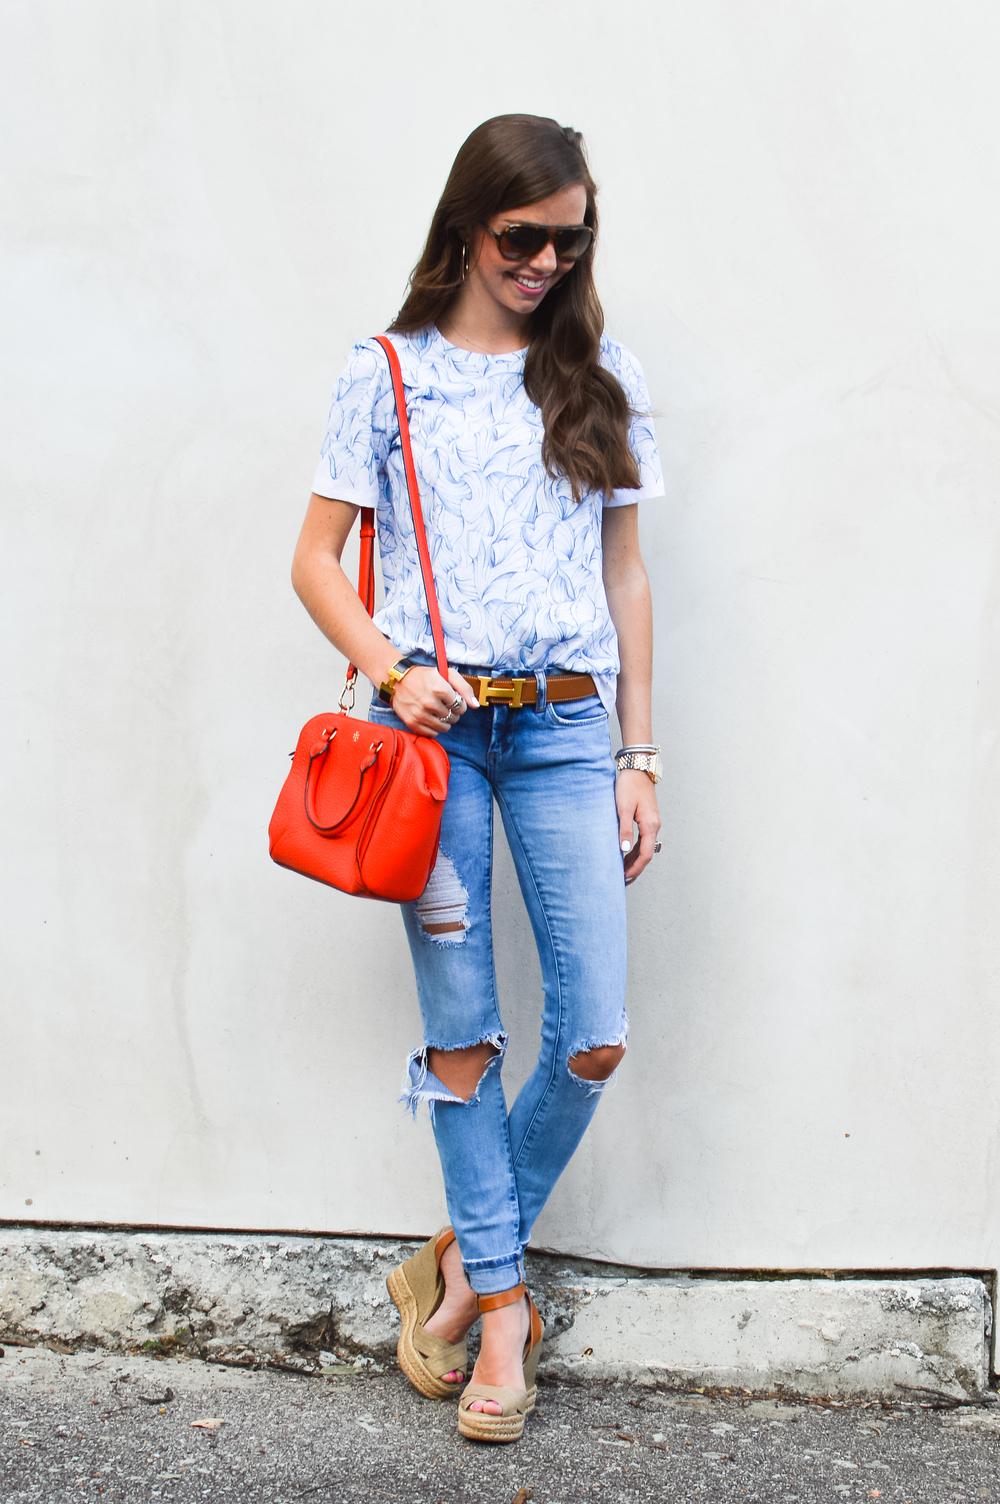 lcb_style_fashion_blogger_tory burch top (7 of 29).jpg